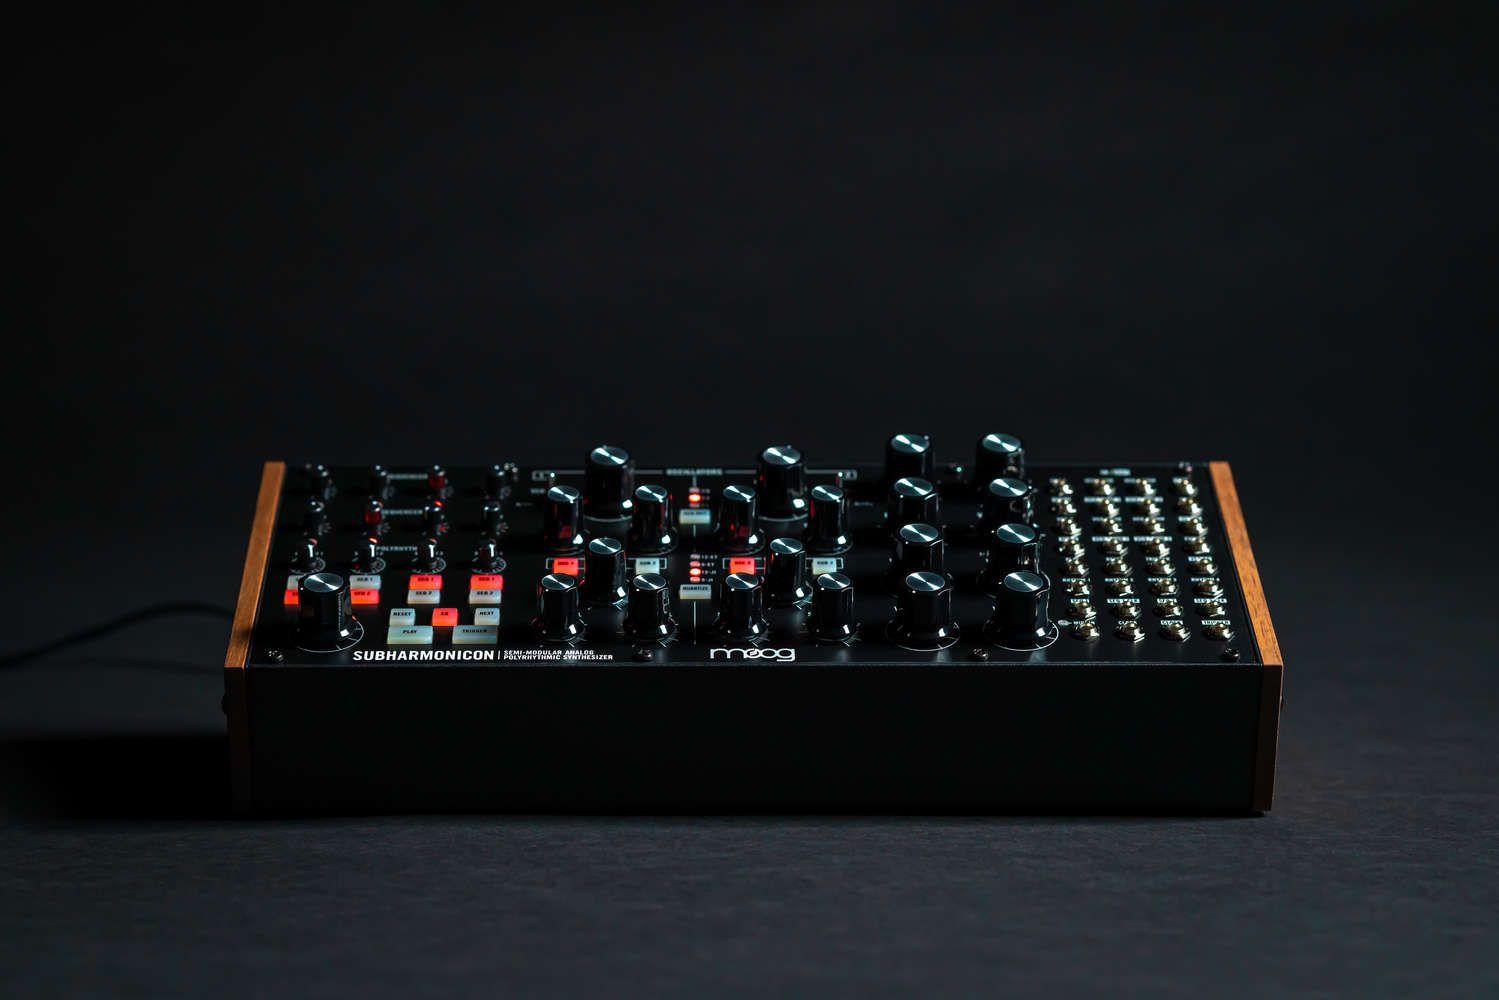 Moog releases new synthesizer: The Subharmonicon